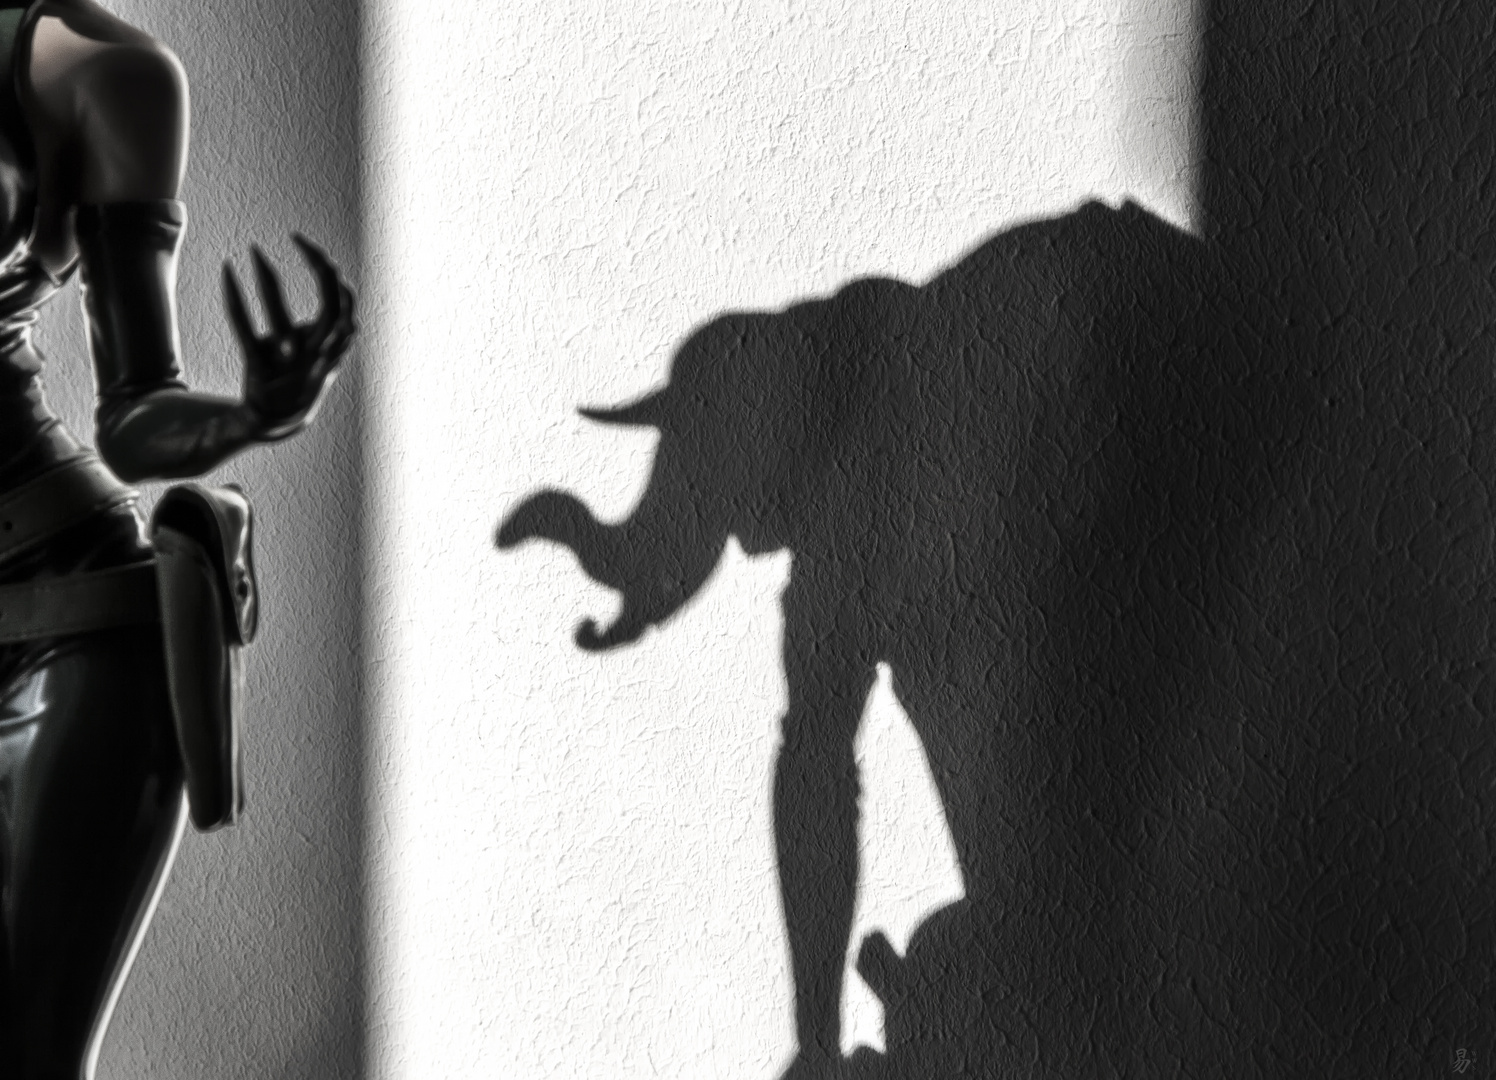 crime scene shadow